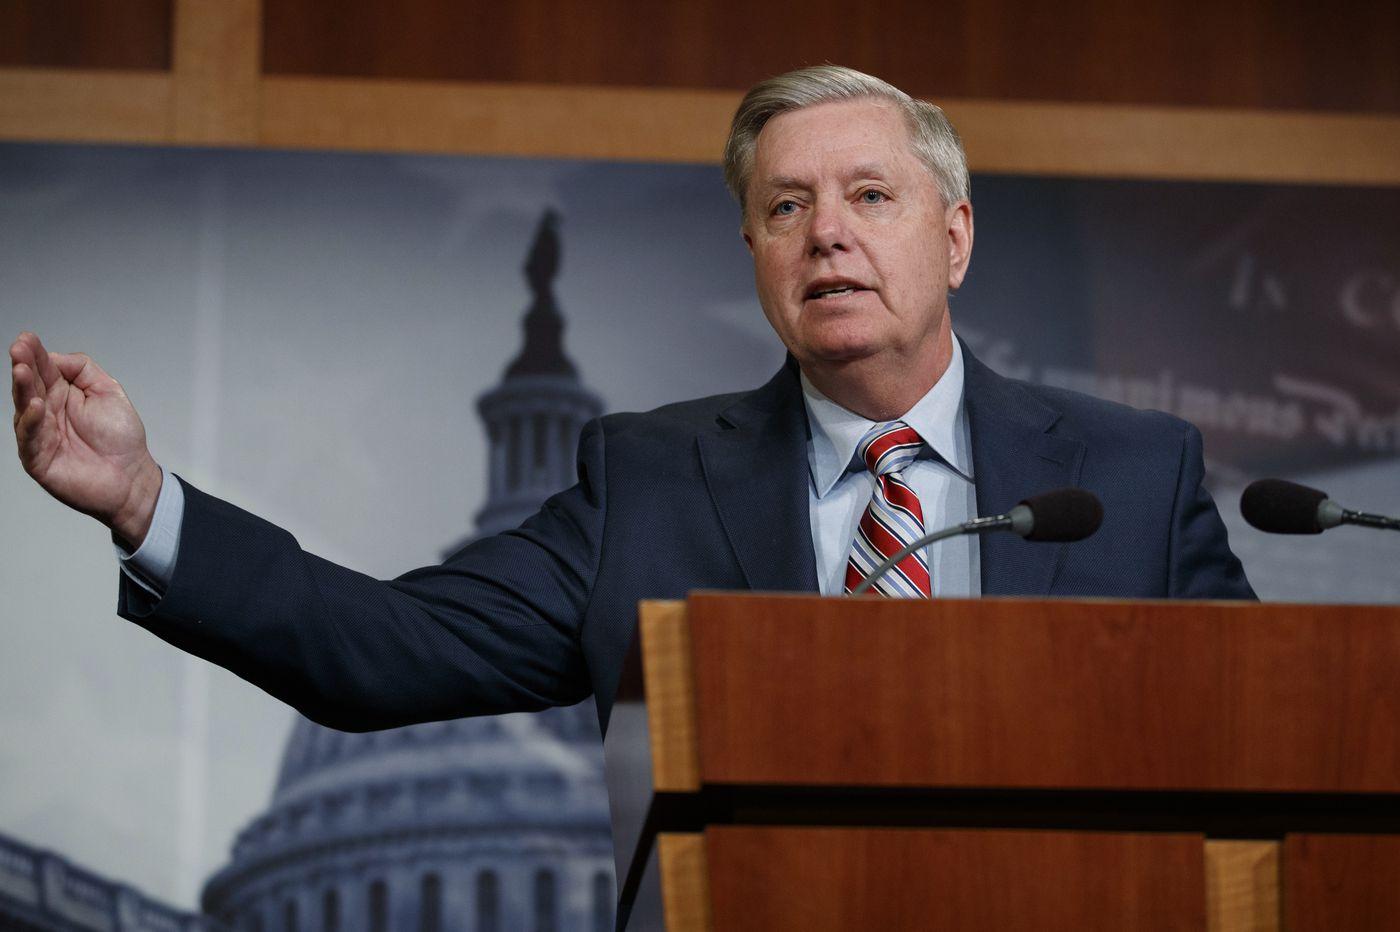 After prominent suicides, U.S. Senate talks gun control — a little bit